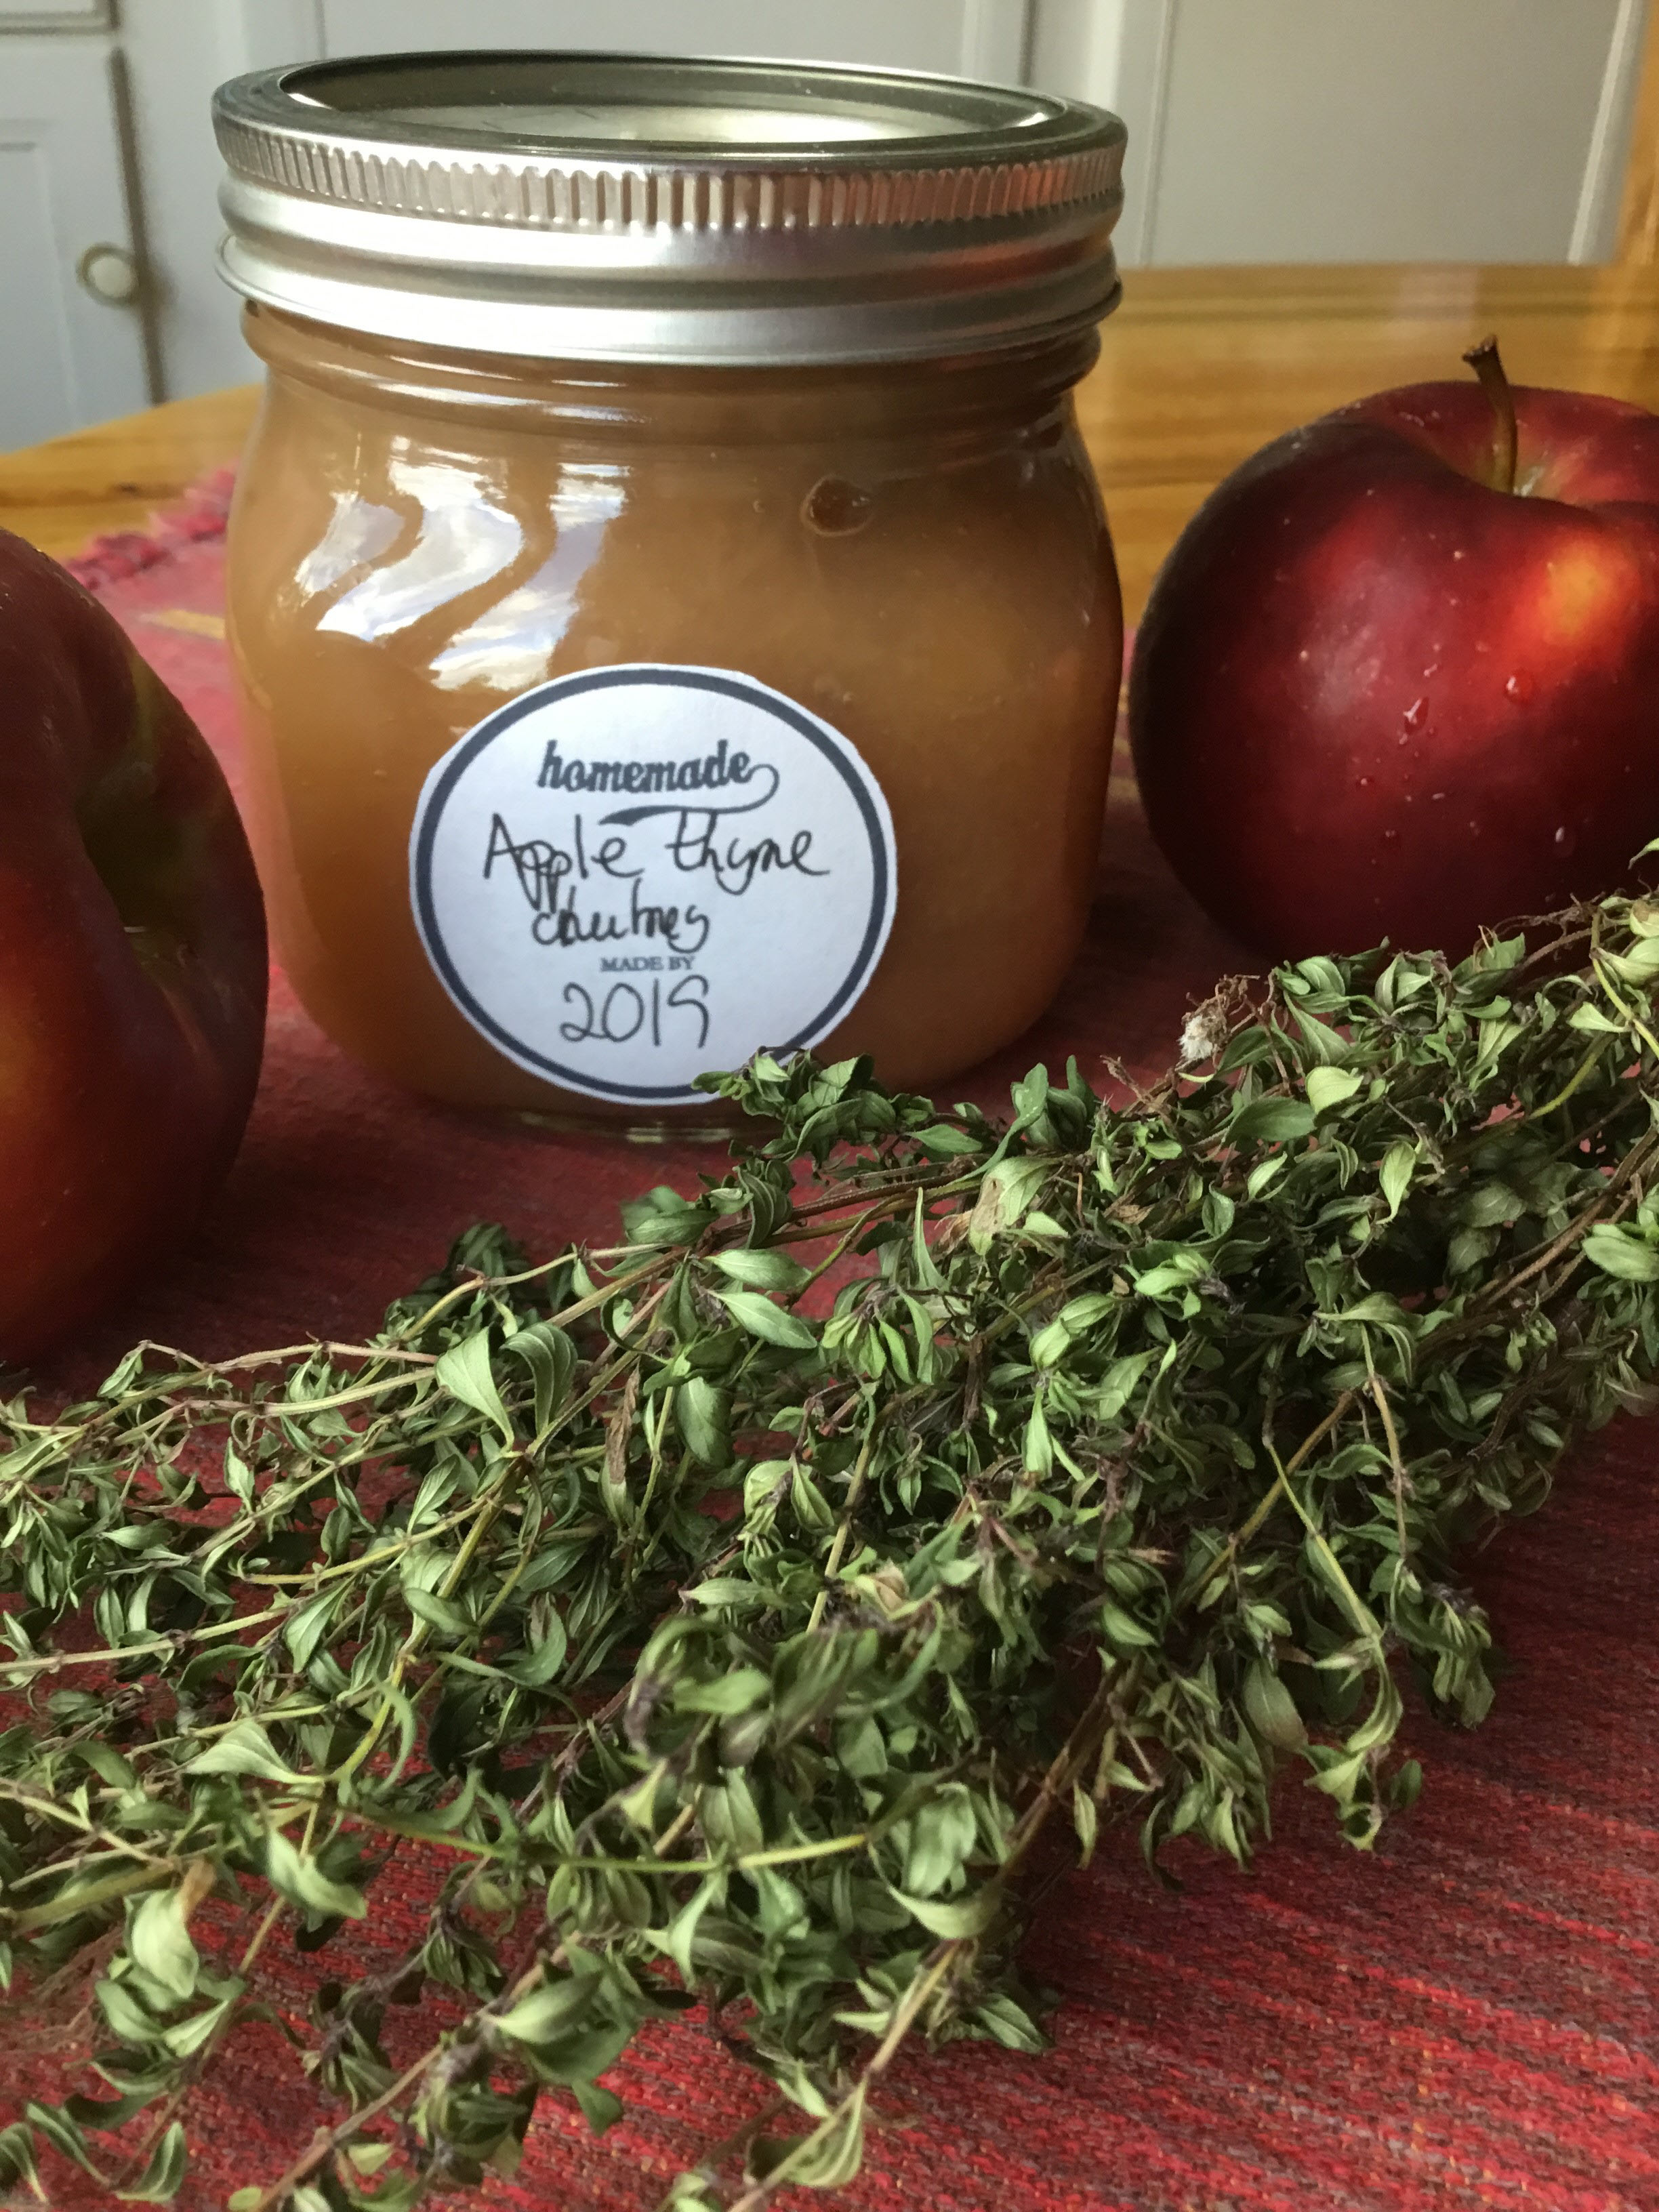 Apple-Thyme Chutney nch